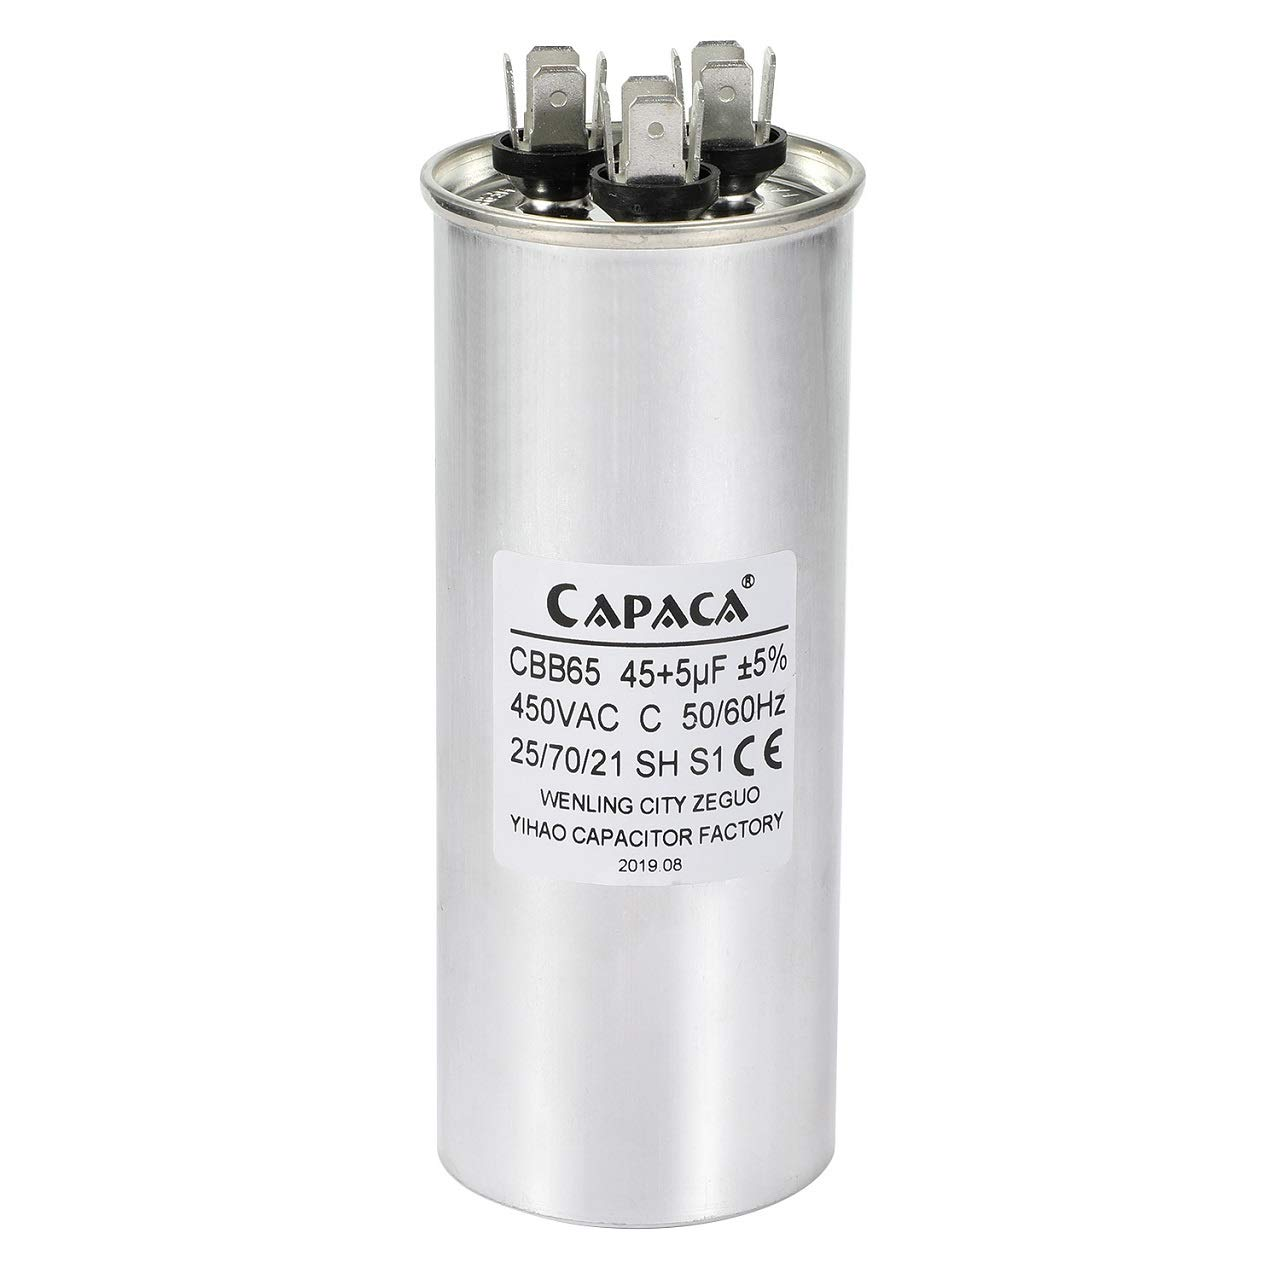 BlueCatELE 40 5 MFD uF CBB65 Capacitor Air Conditioner Capacitor Round Dural Motor Run Capacitor Withstand 450V AC